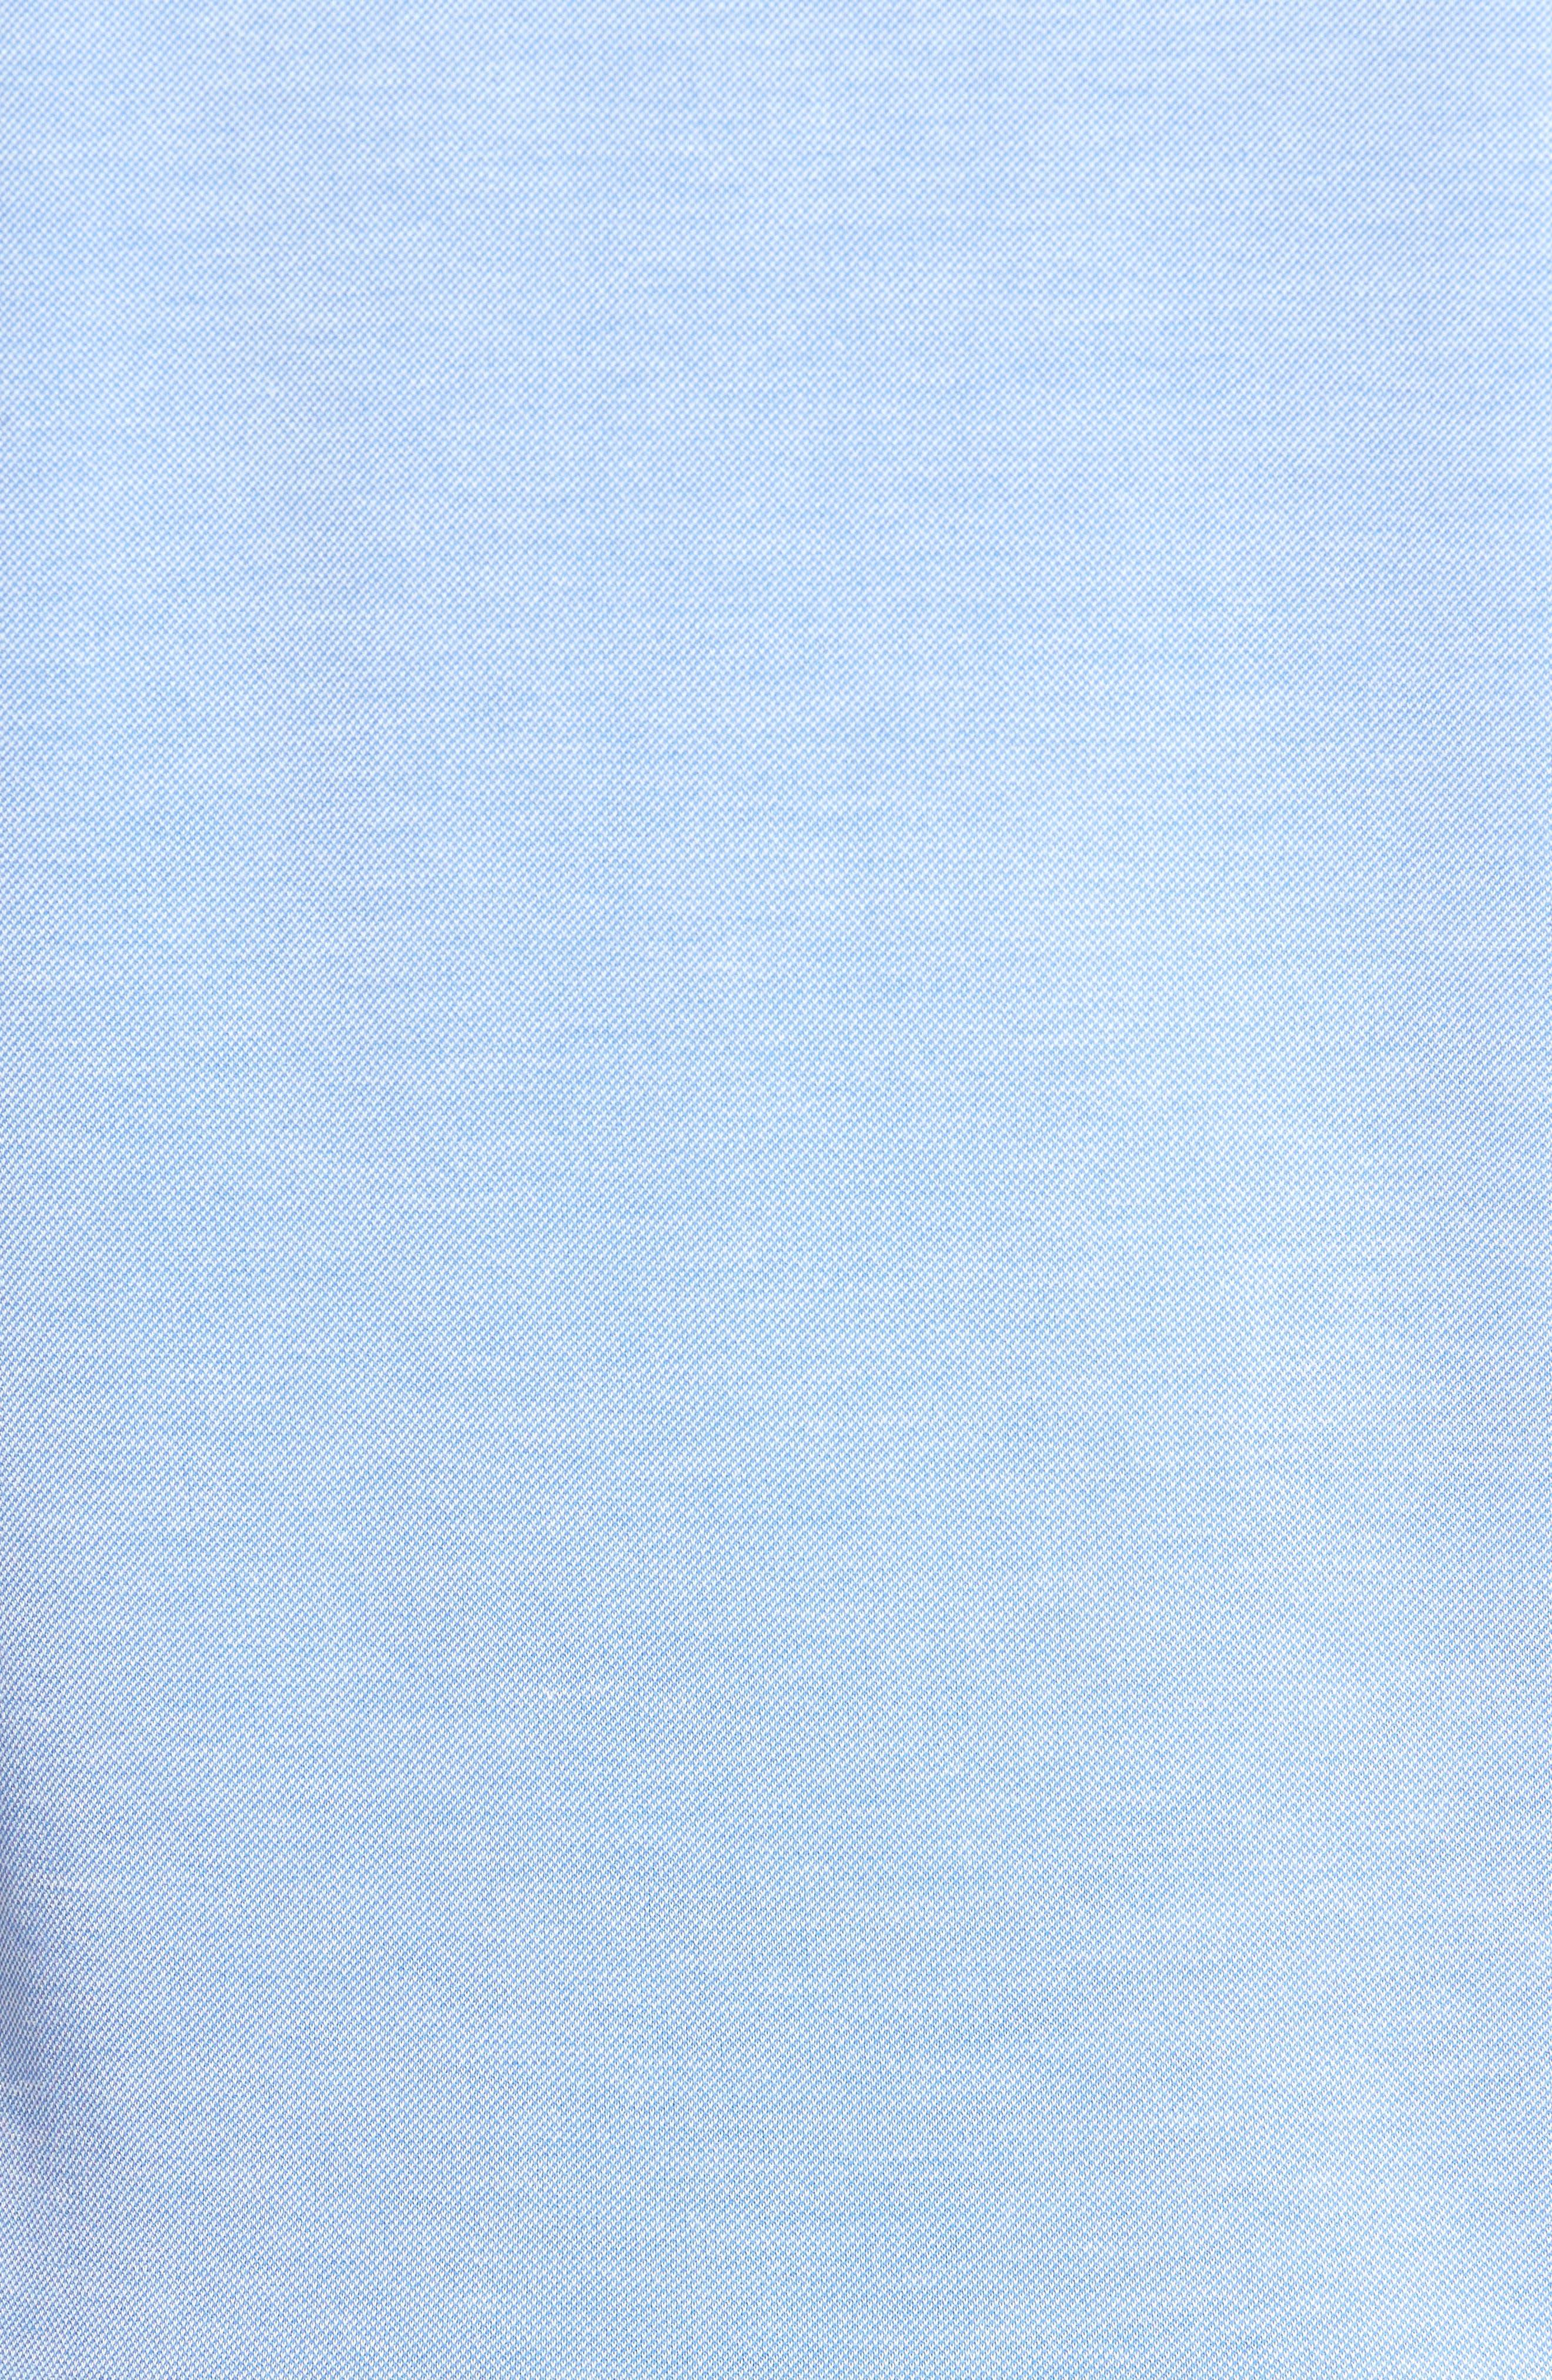 Mikeytt Trim Fit Polo,                             Alternate thumbnail 5, color,                             Bright Blue